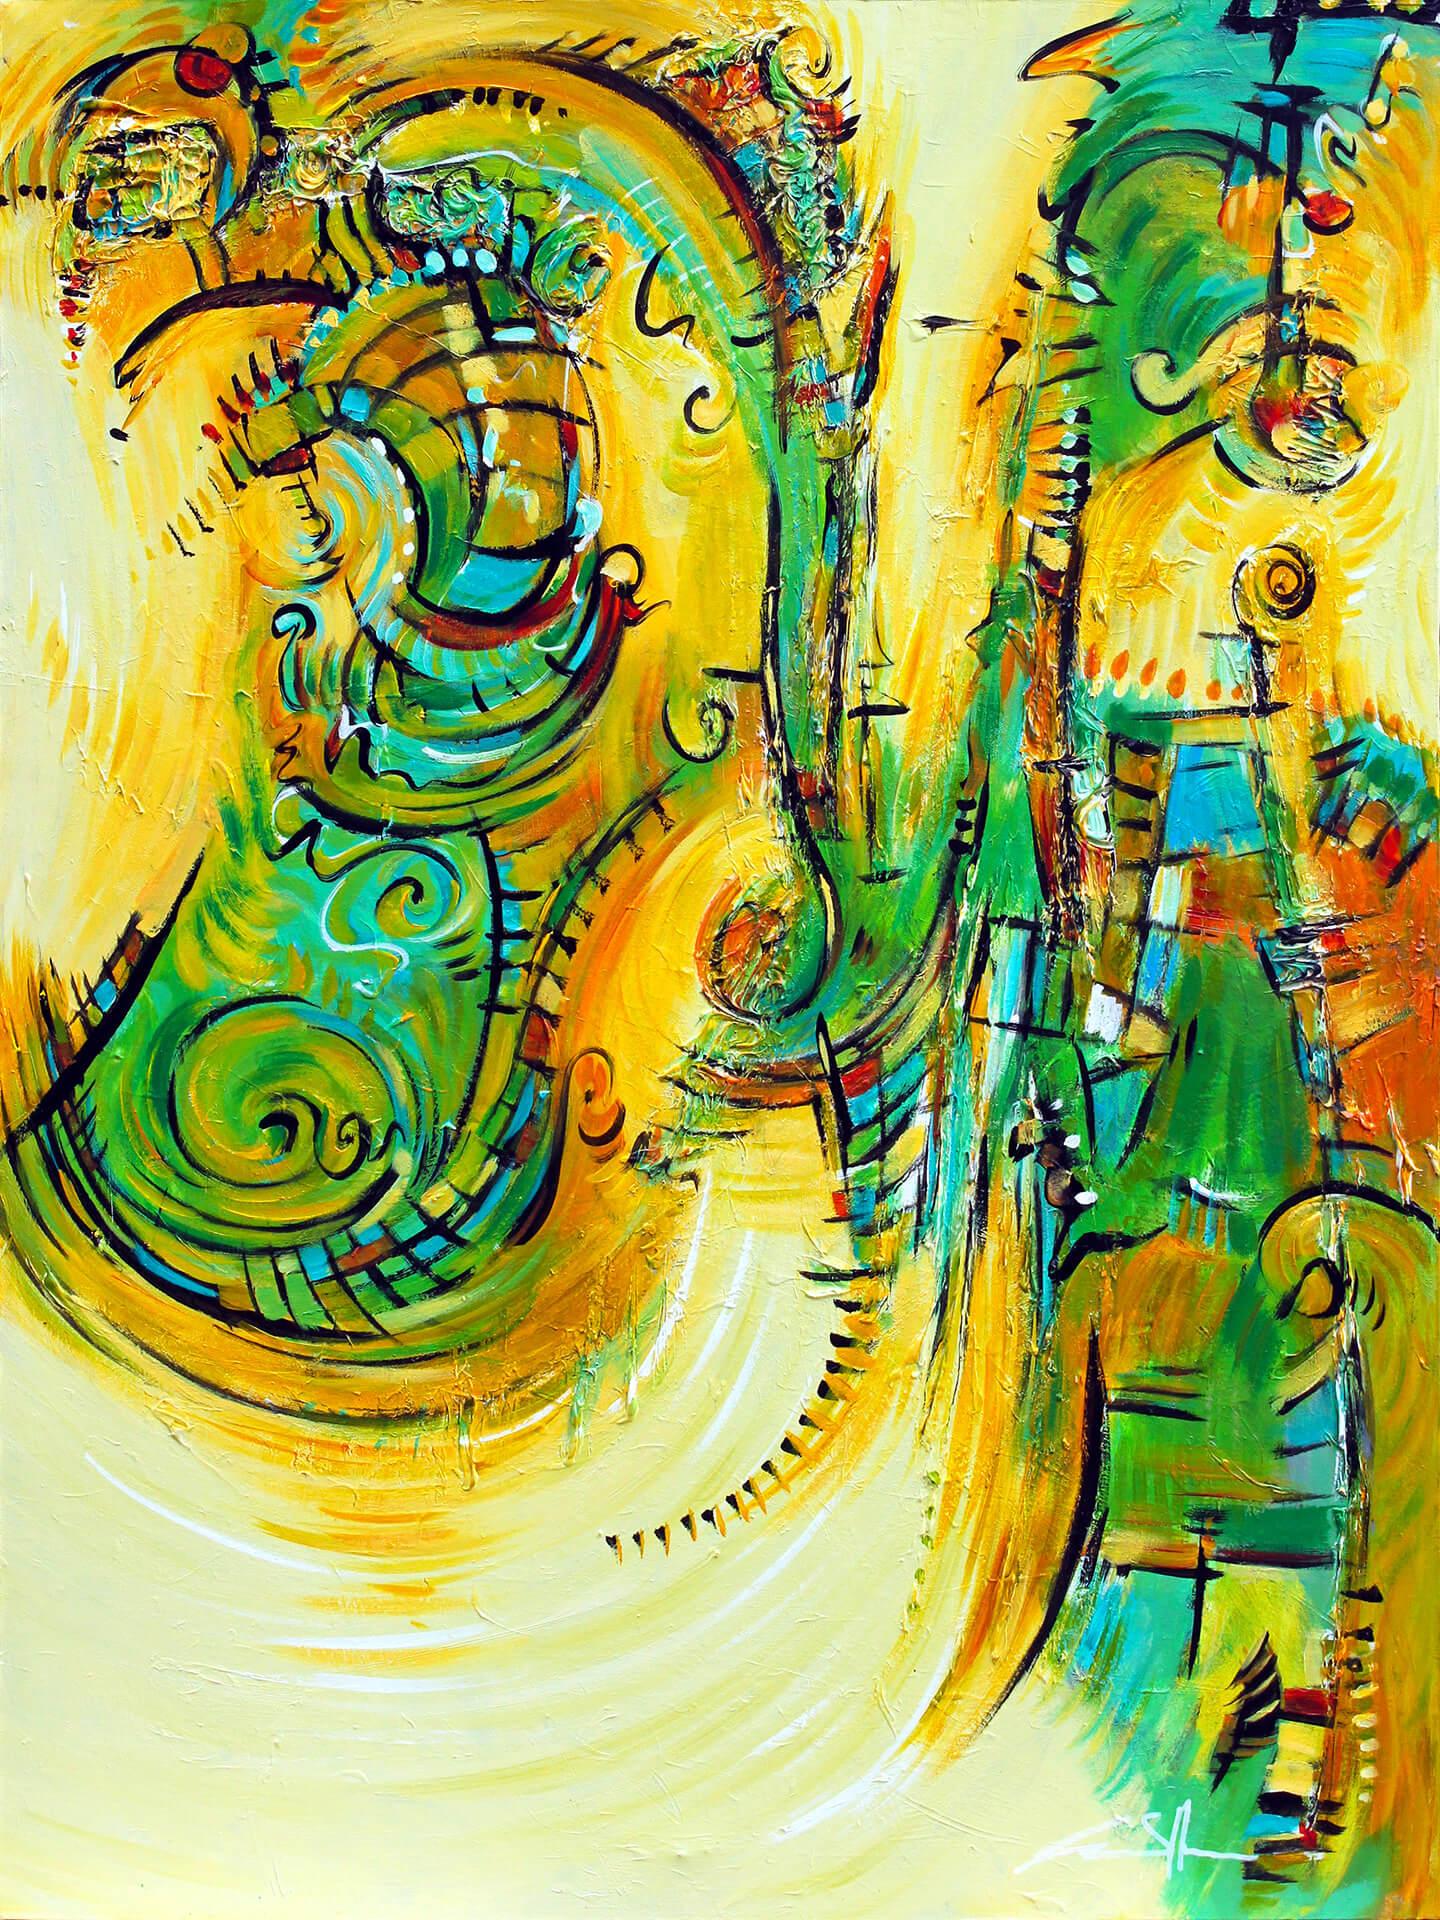 art-eric-j-hughes-artiste-peintre-canadien-tableau-delirium-espace-ondulatoire